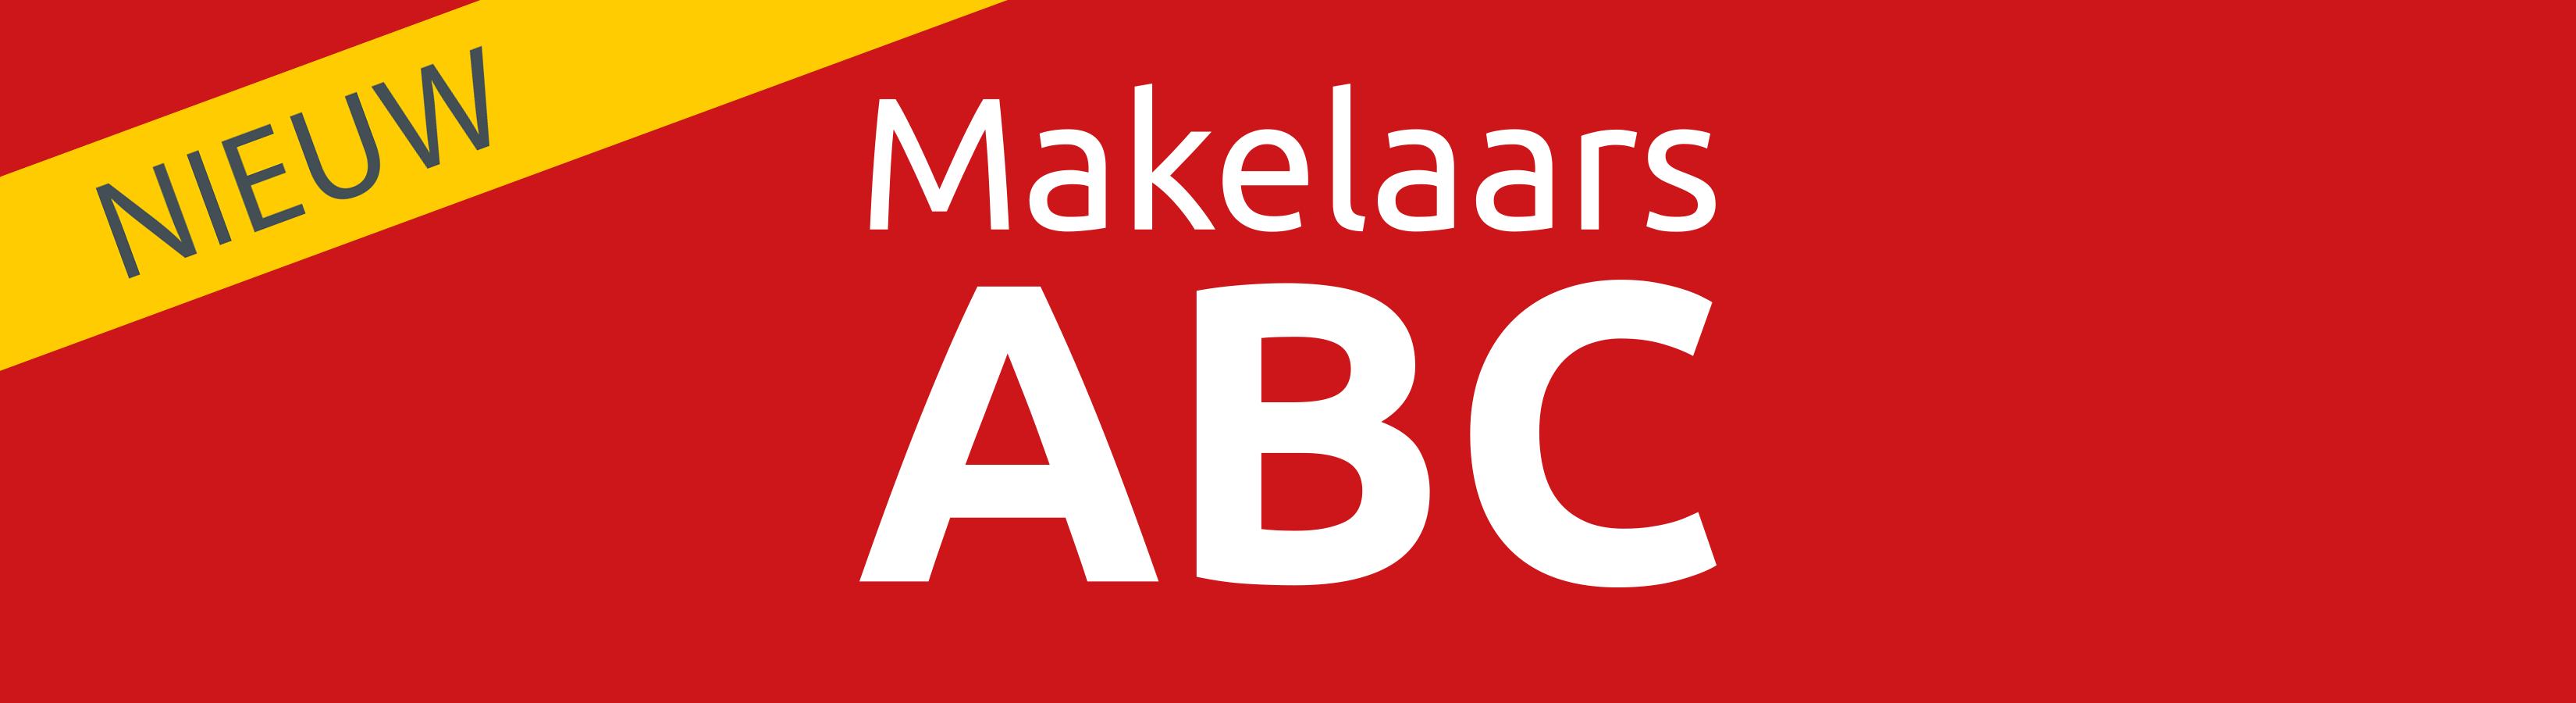 50019130_Banner Makelaars ABC 3300x900px